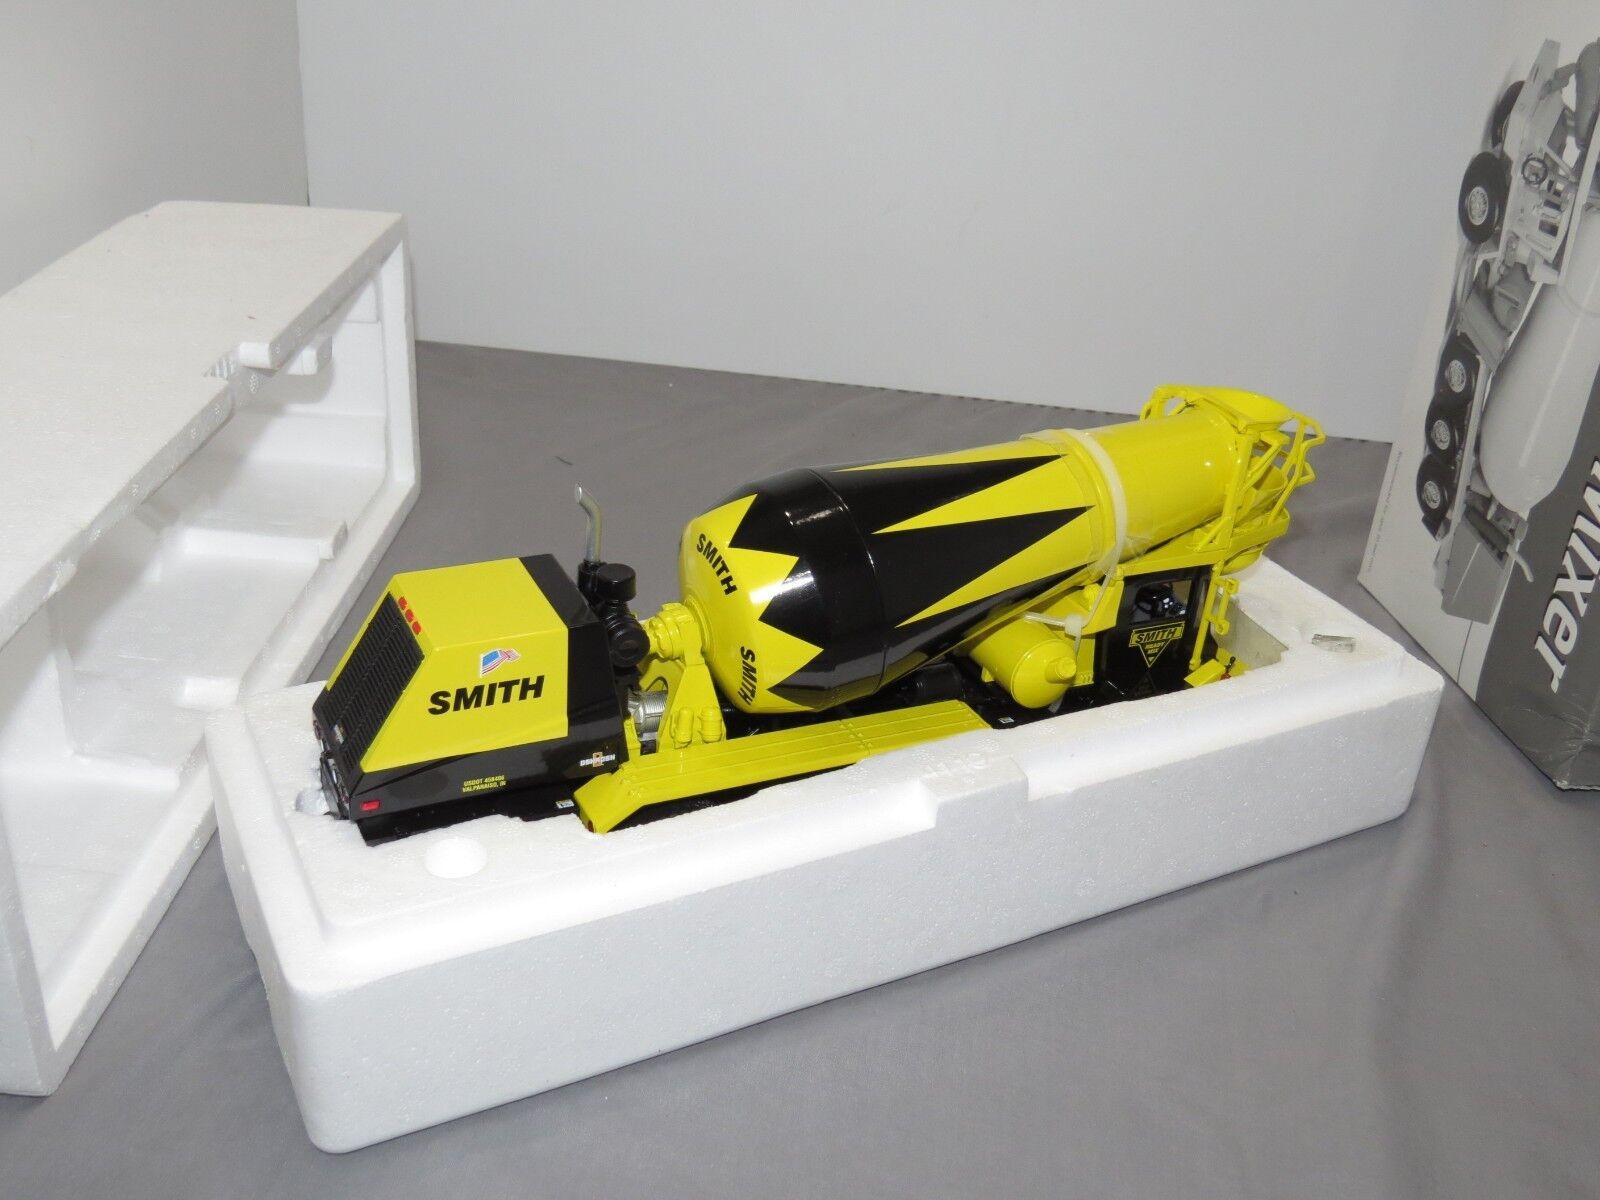 SMITH Oshkosh Cement Mixer MINT NIB 1 34 First Gear Front Discharge Valparaiso I